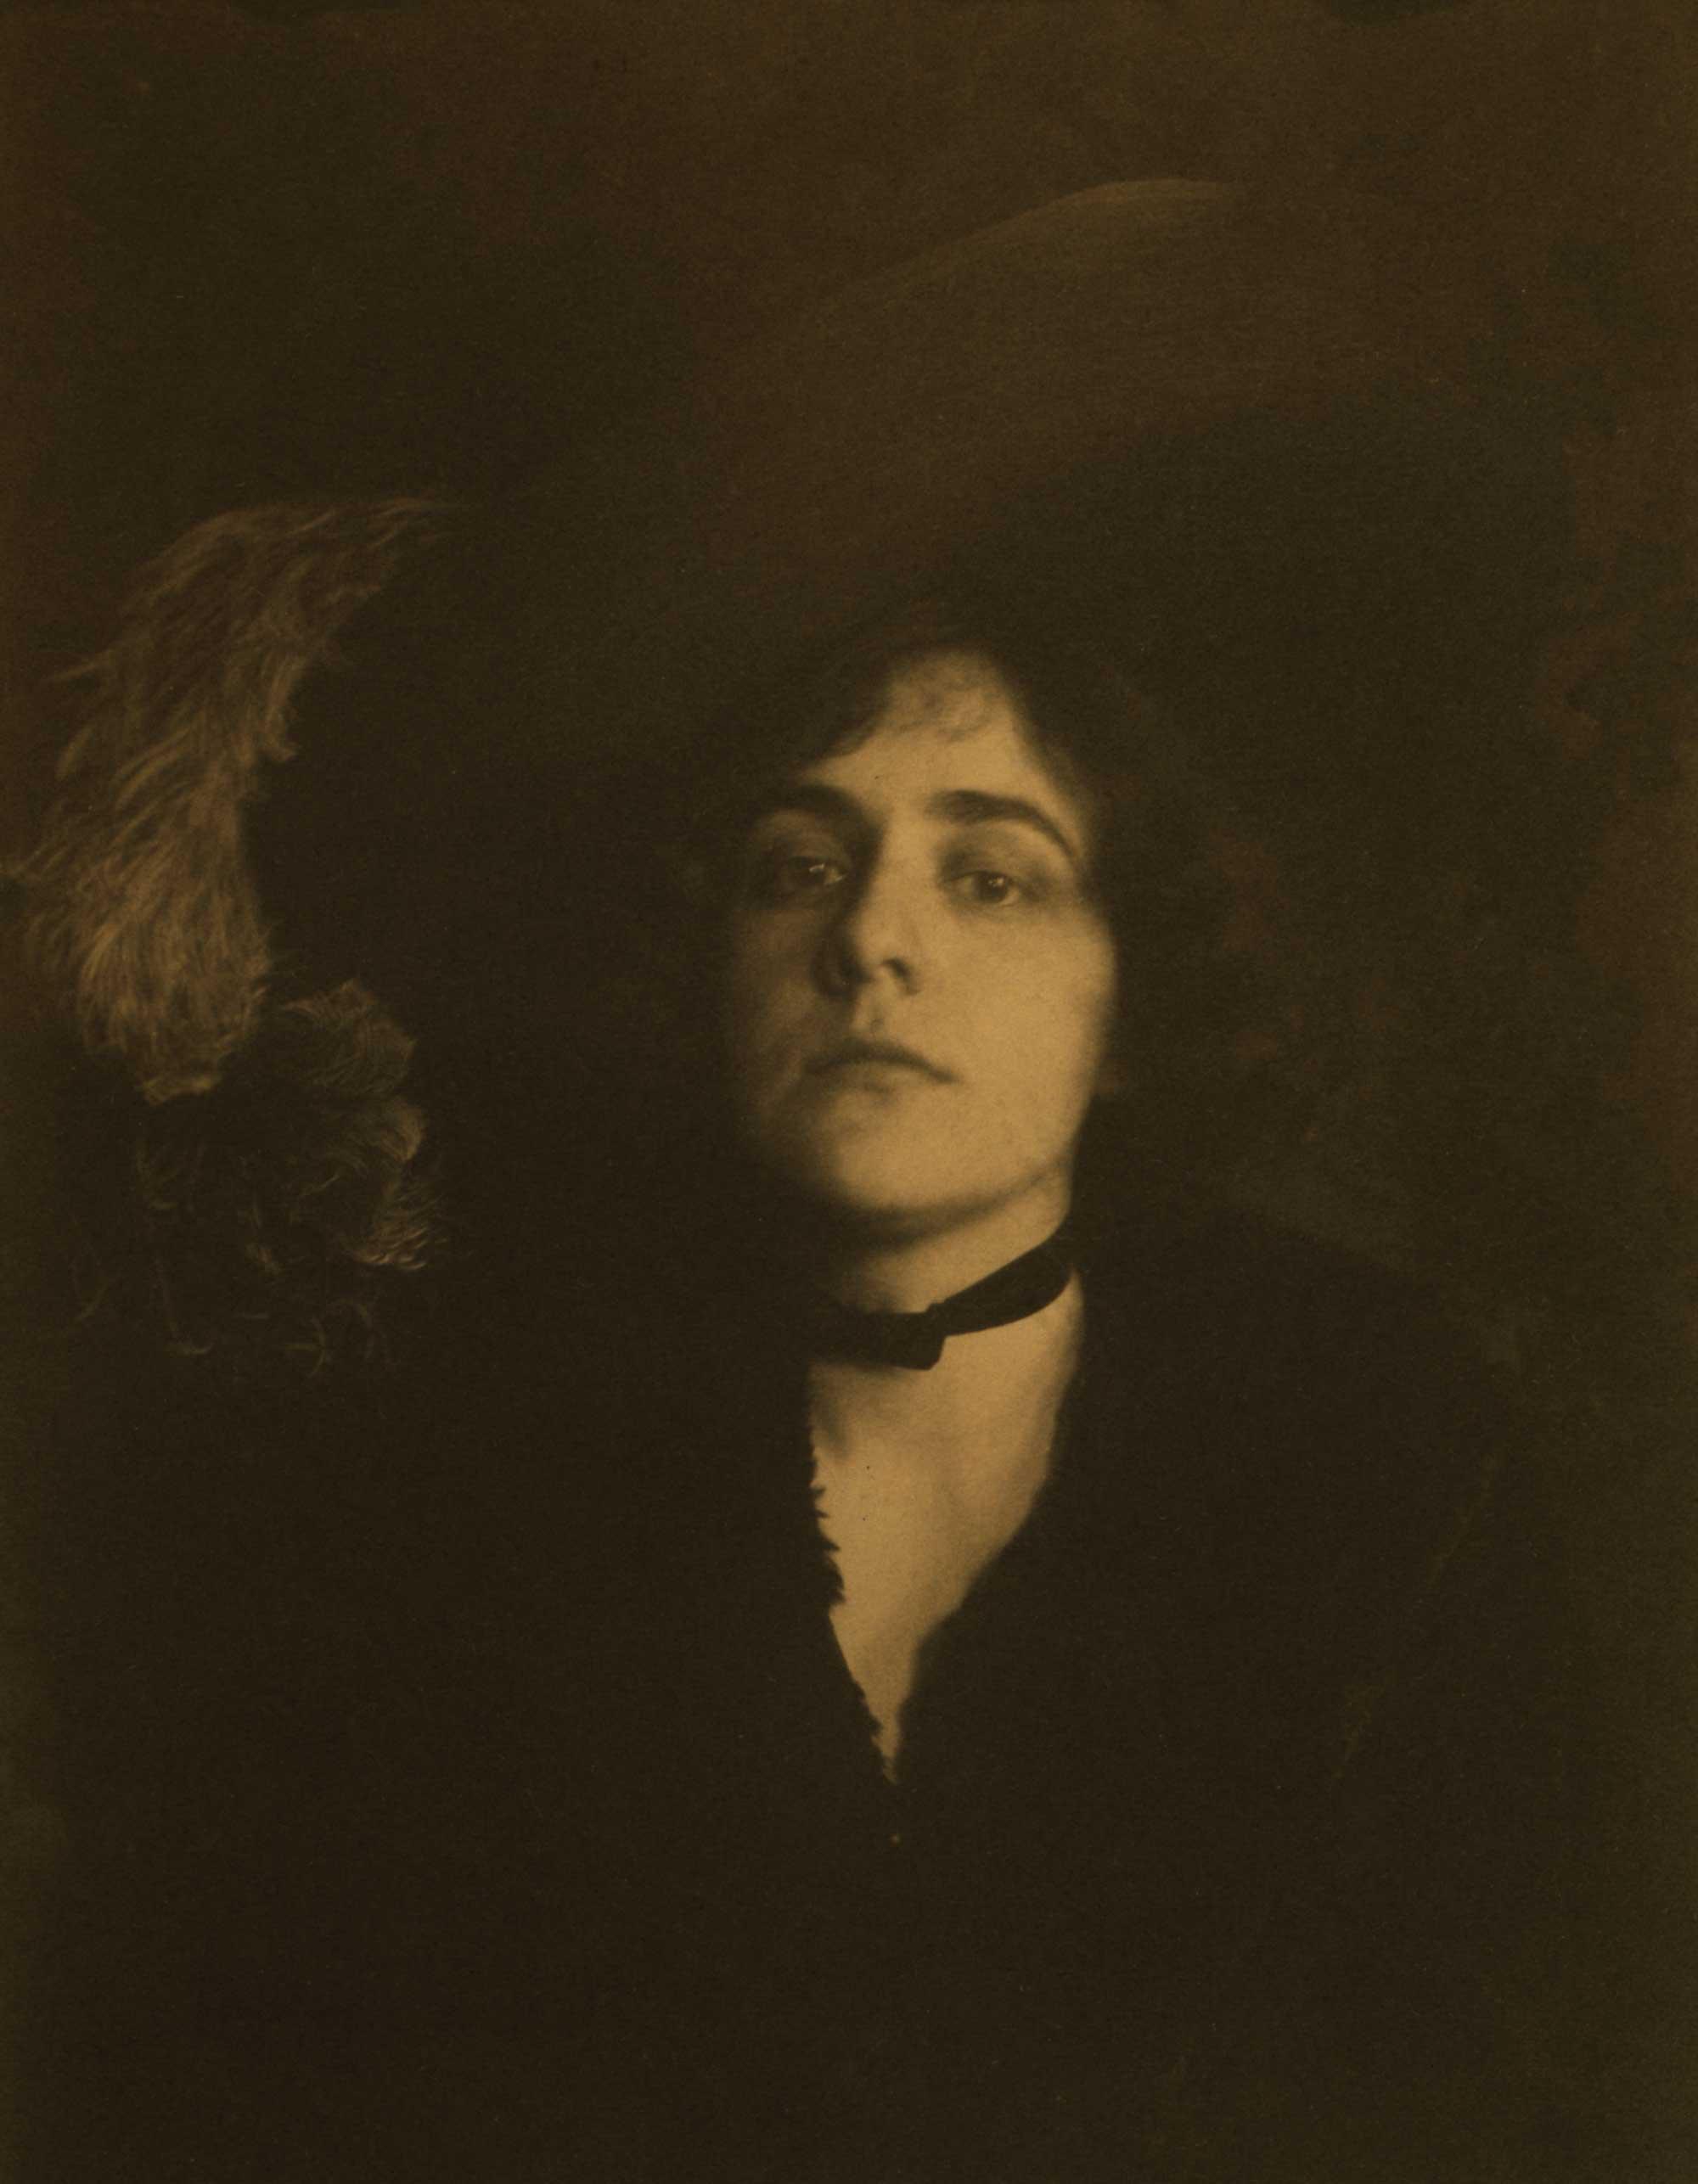 c. 1895: The Gainsborough Hat (Ethel Reed)